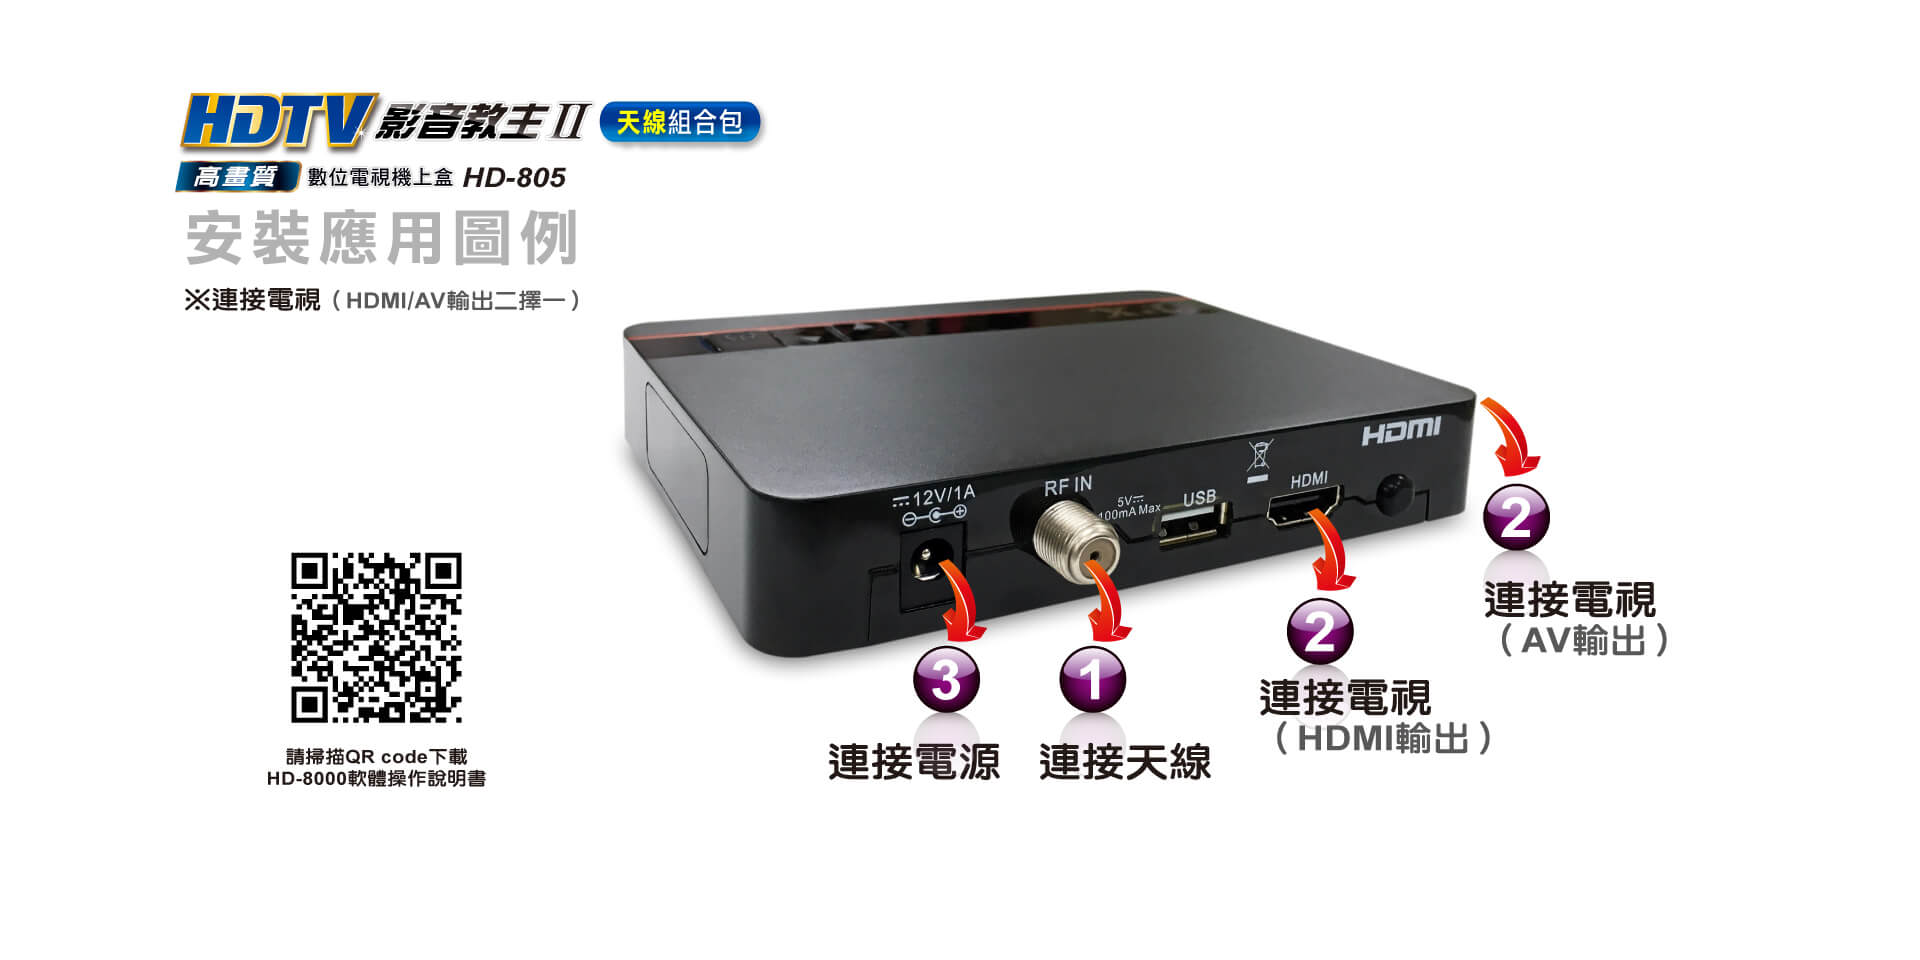 proimages/product/STB機上盒/HDP-805/HDP-805-05.jpg